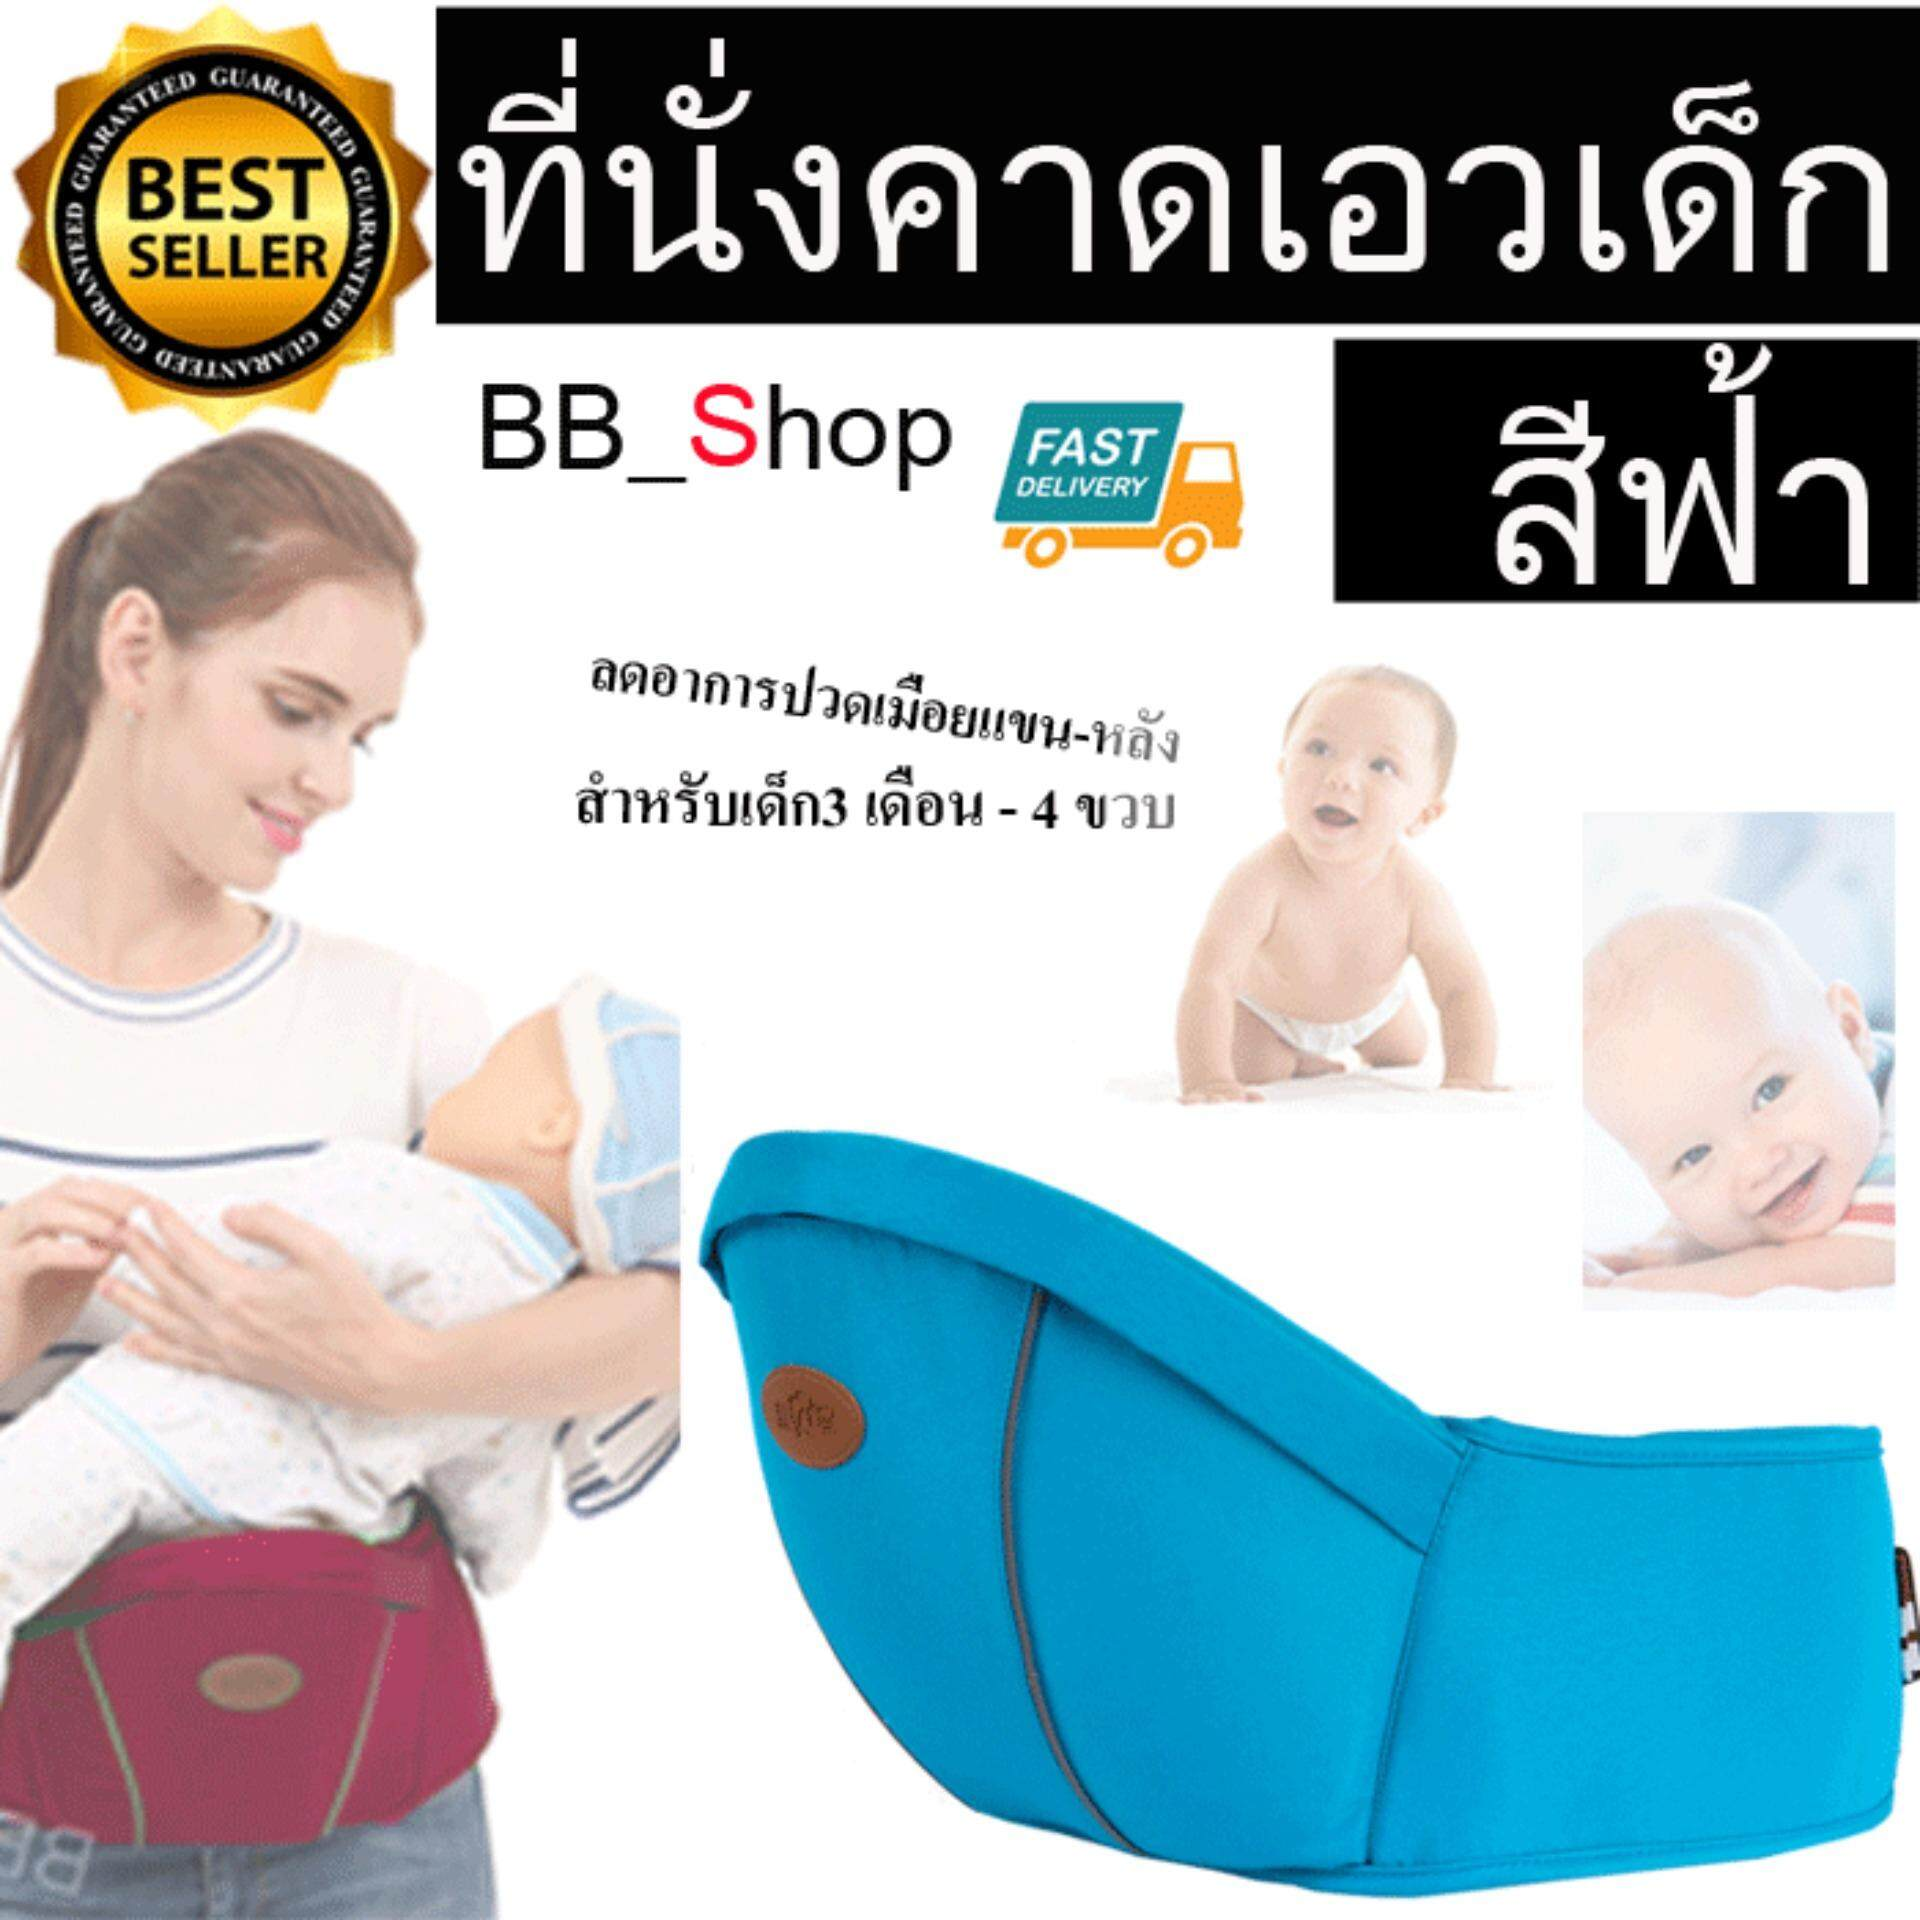 BB Shop เป้อุ้มเด็ก เป้สะพายเด็ก ที่อุ้มเด็ก เด็กอ่อน Baby Carrier ที่นั้งคาดเอว ที่นั้งเด็ก เป้คาดเอว